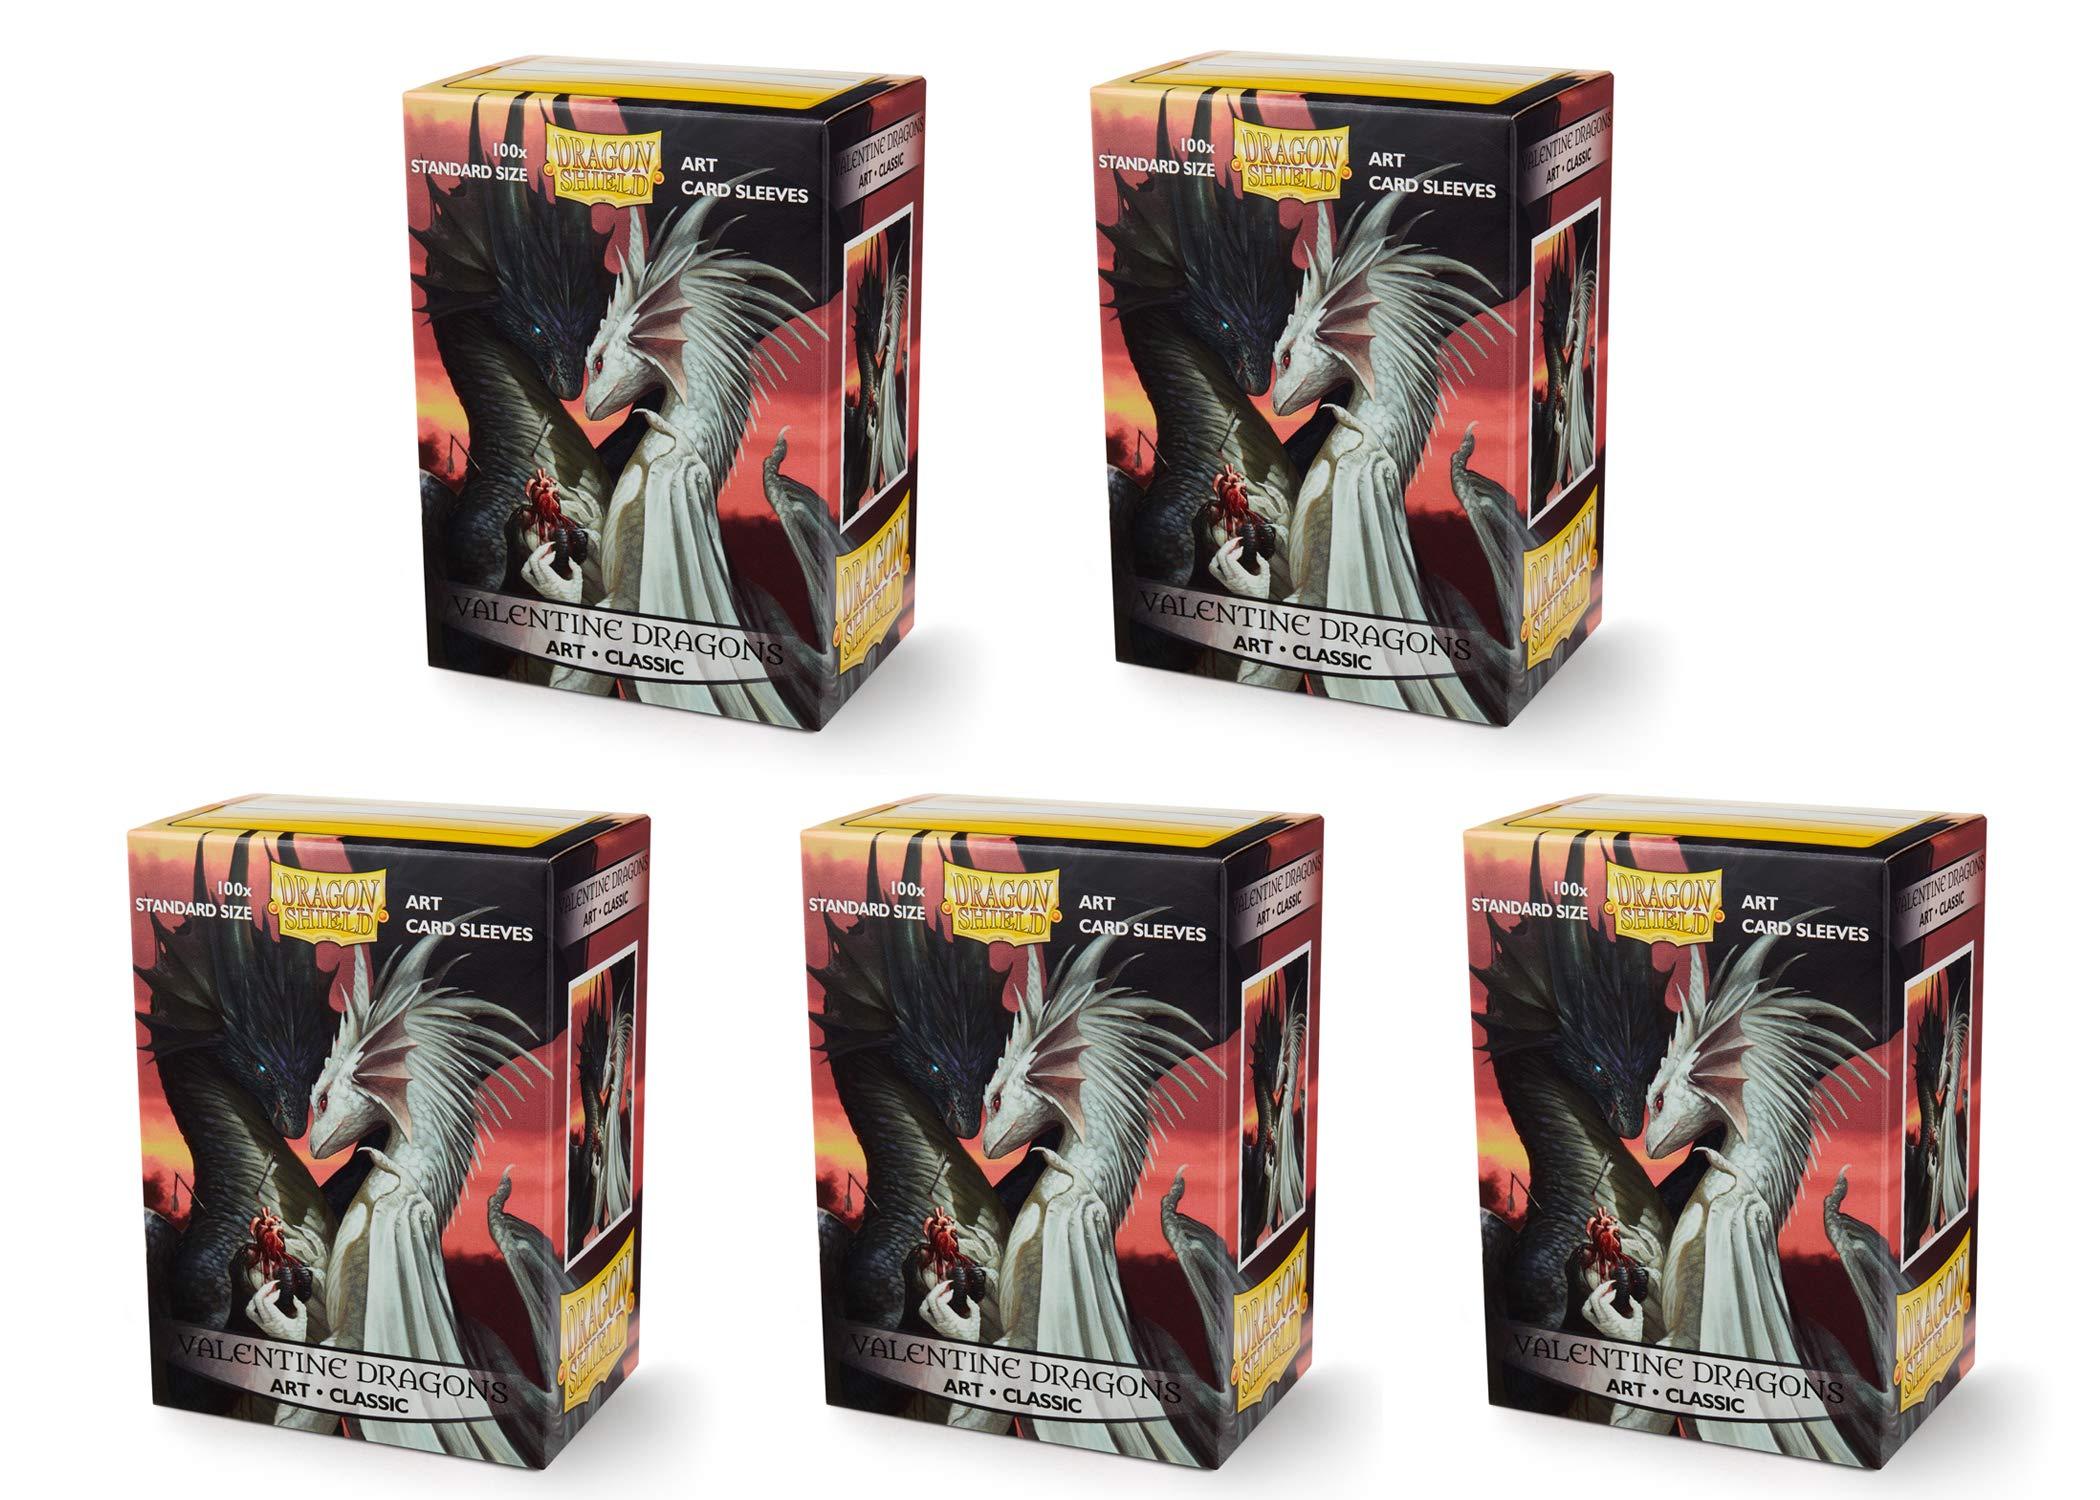 5 Packs Dragon Shield Classic Art Valentine Dragons Standard Size 100 ct Card Sleeves Value Bundle!